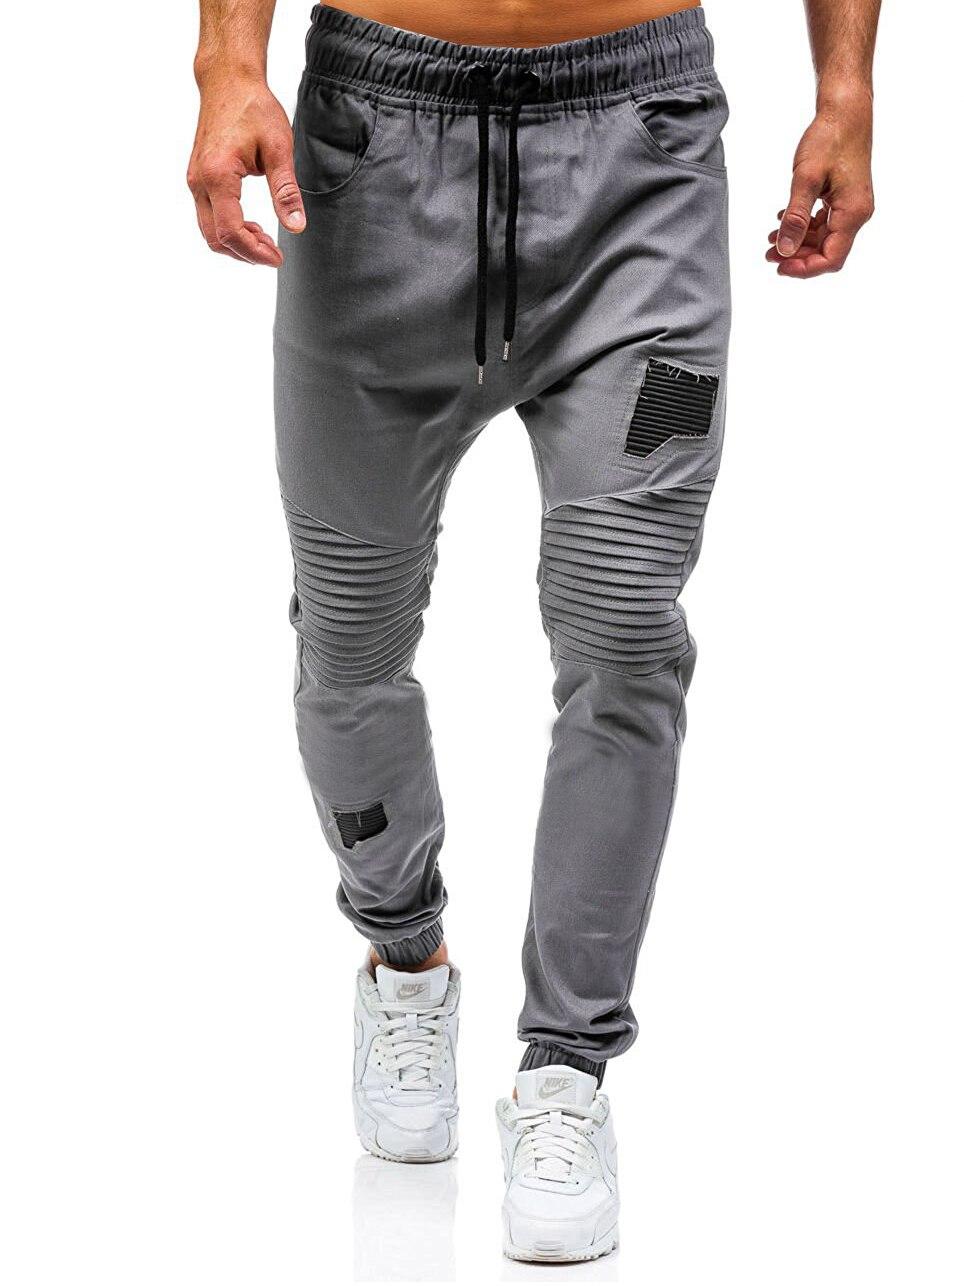 Men Sweatpants Casual Pants Slim fit Drawstring Sweatpants Slacks Elastic Waist Patchwork Pleated Ultrathin Male Trousers Jogger 21